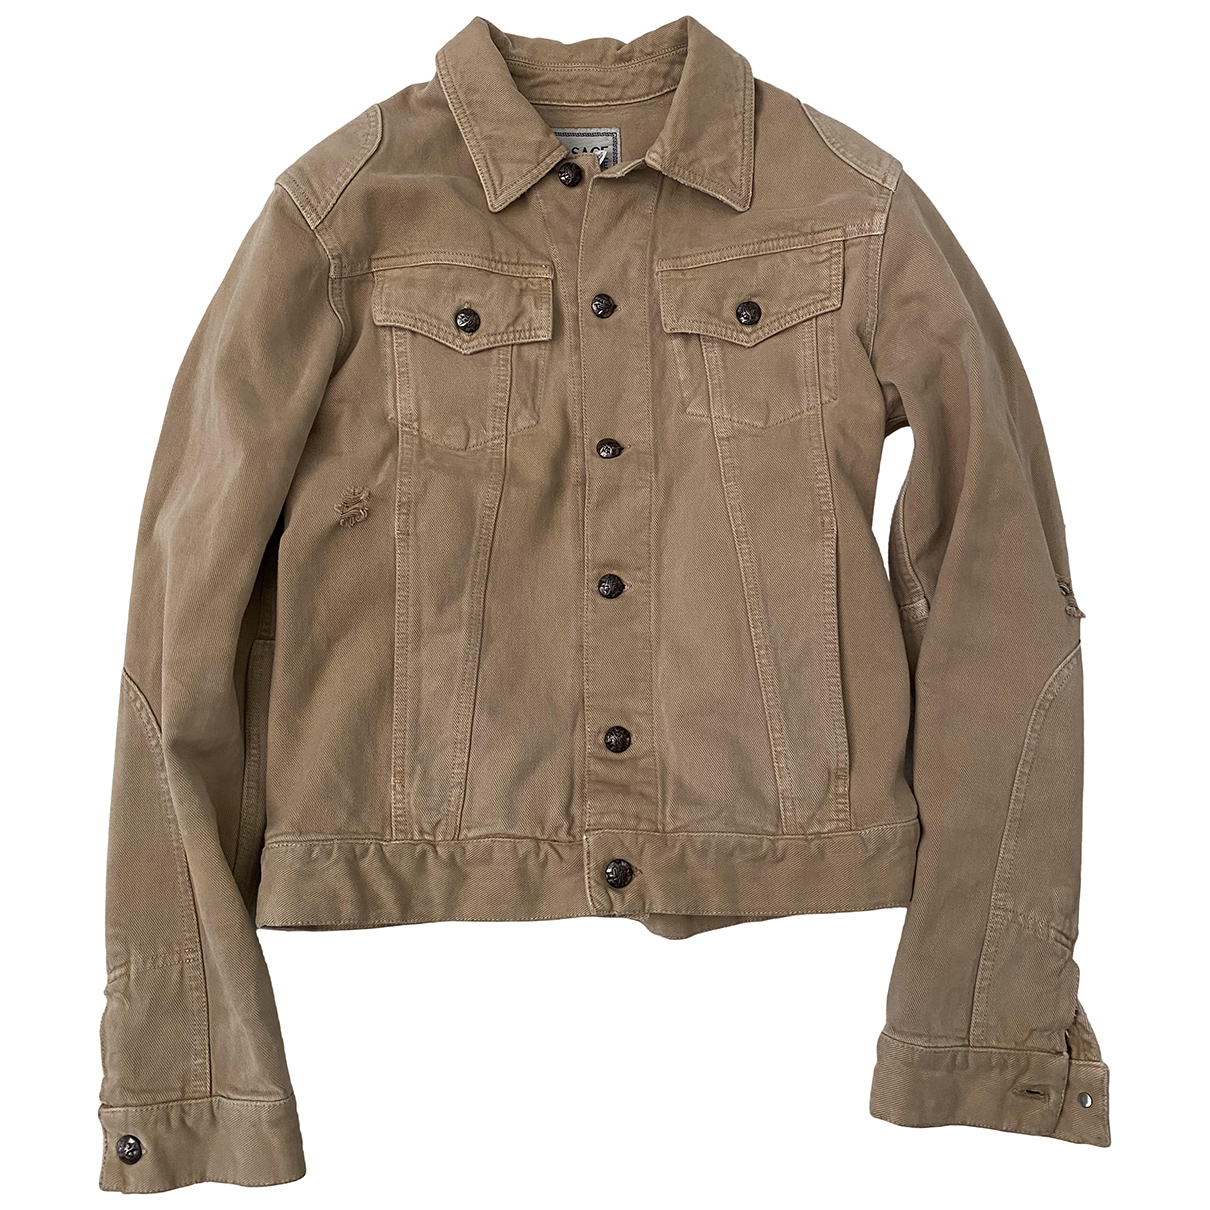 Versace Jeans N Brown Cotton jacket  for Men M International